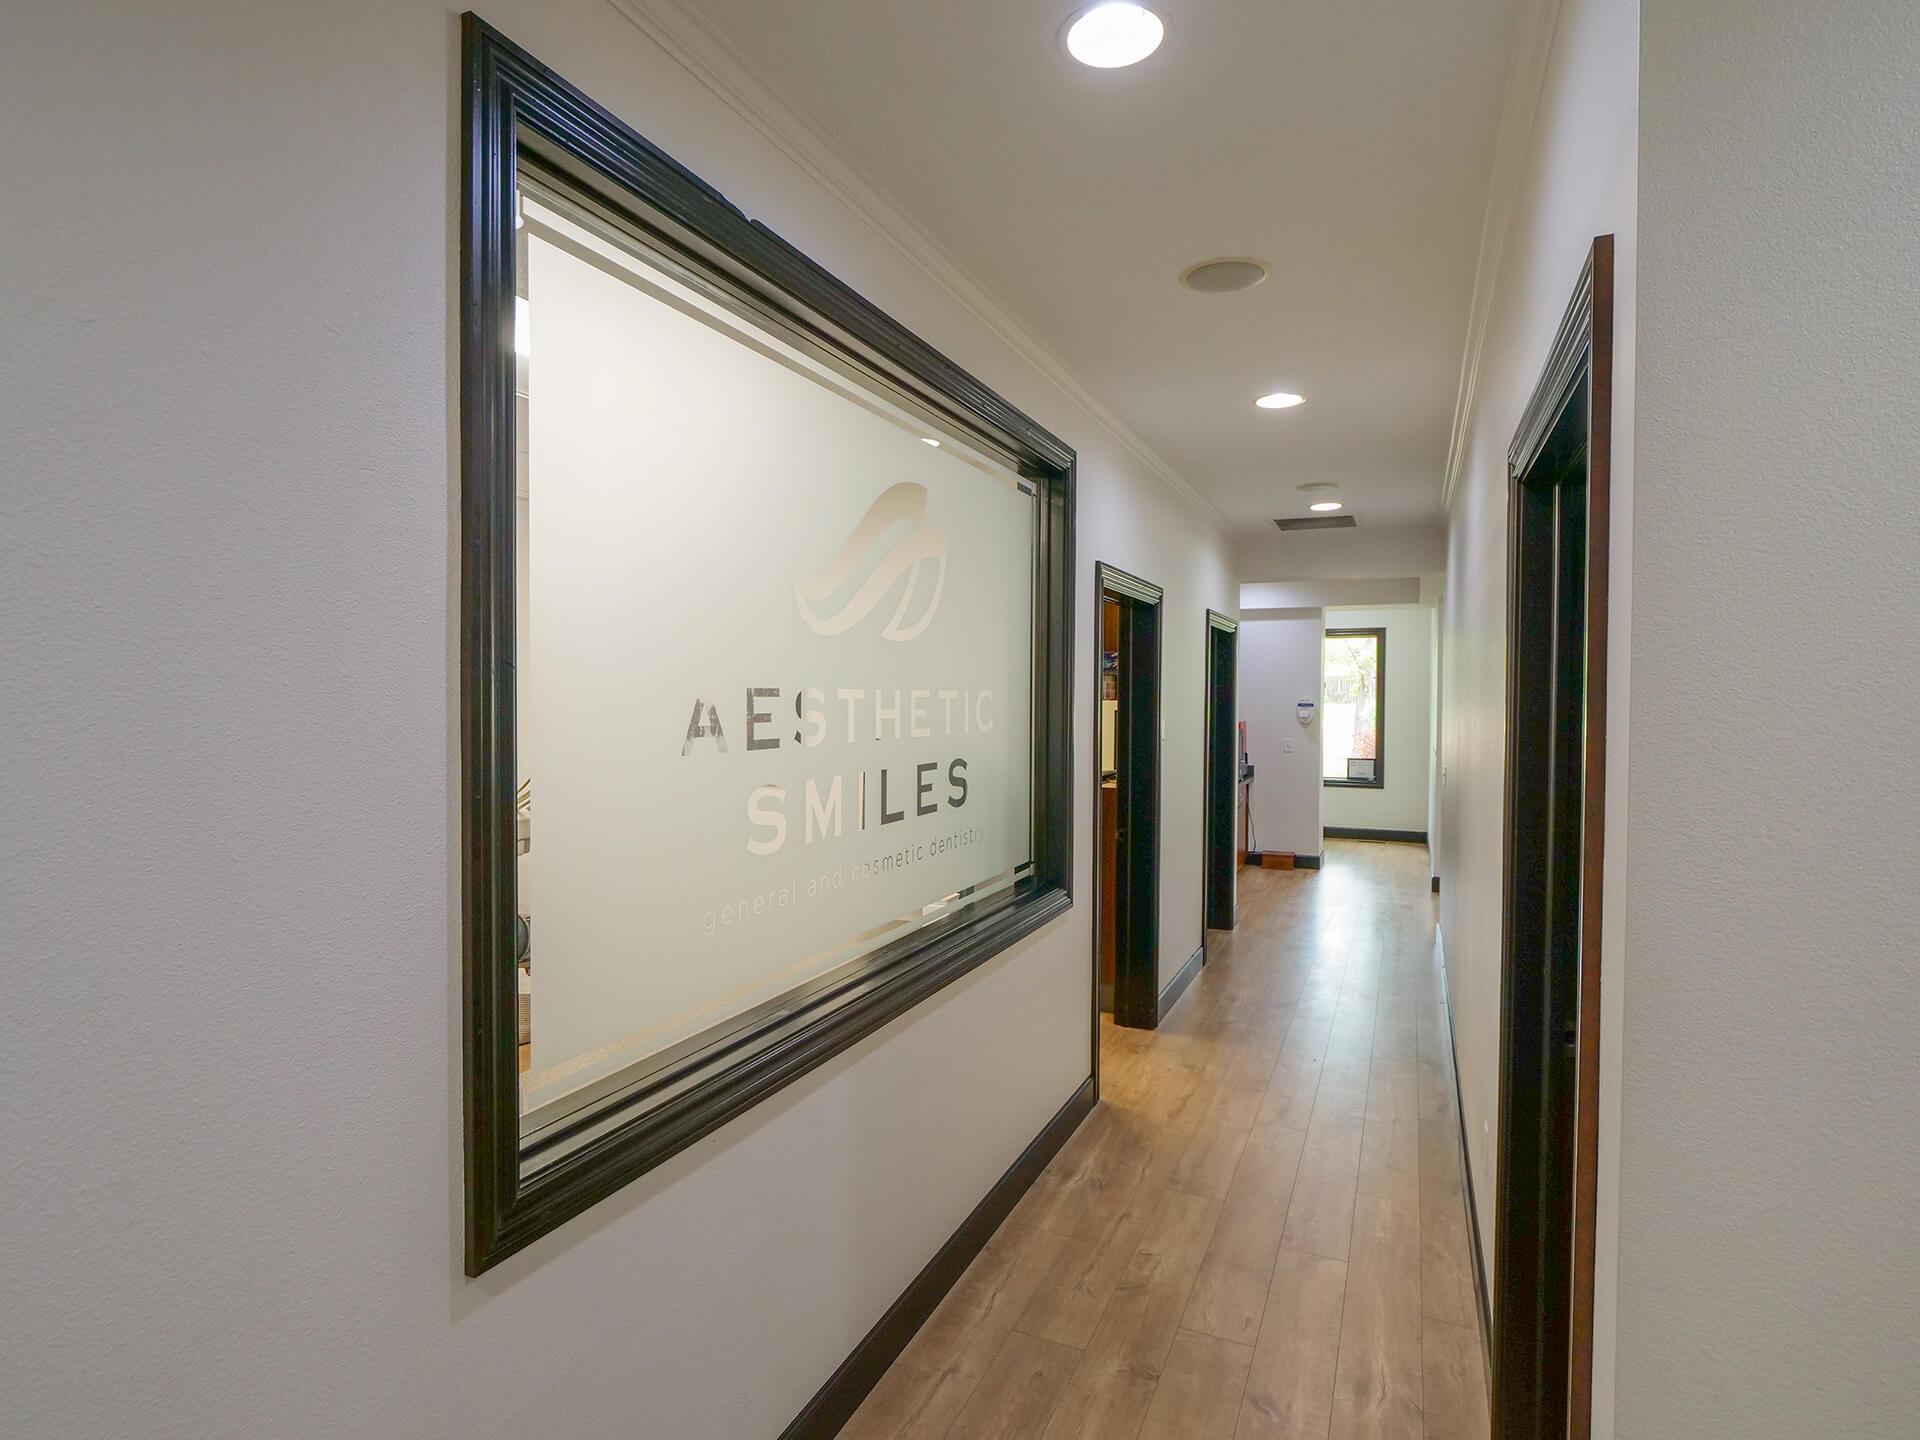 Aesthetic Smiles Office Photo-3